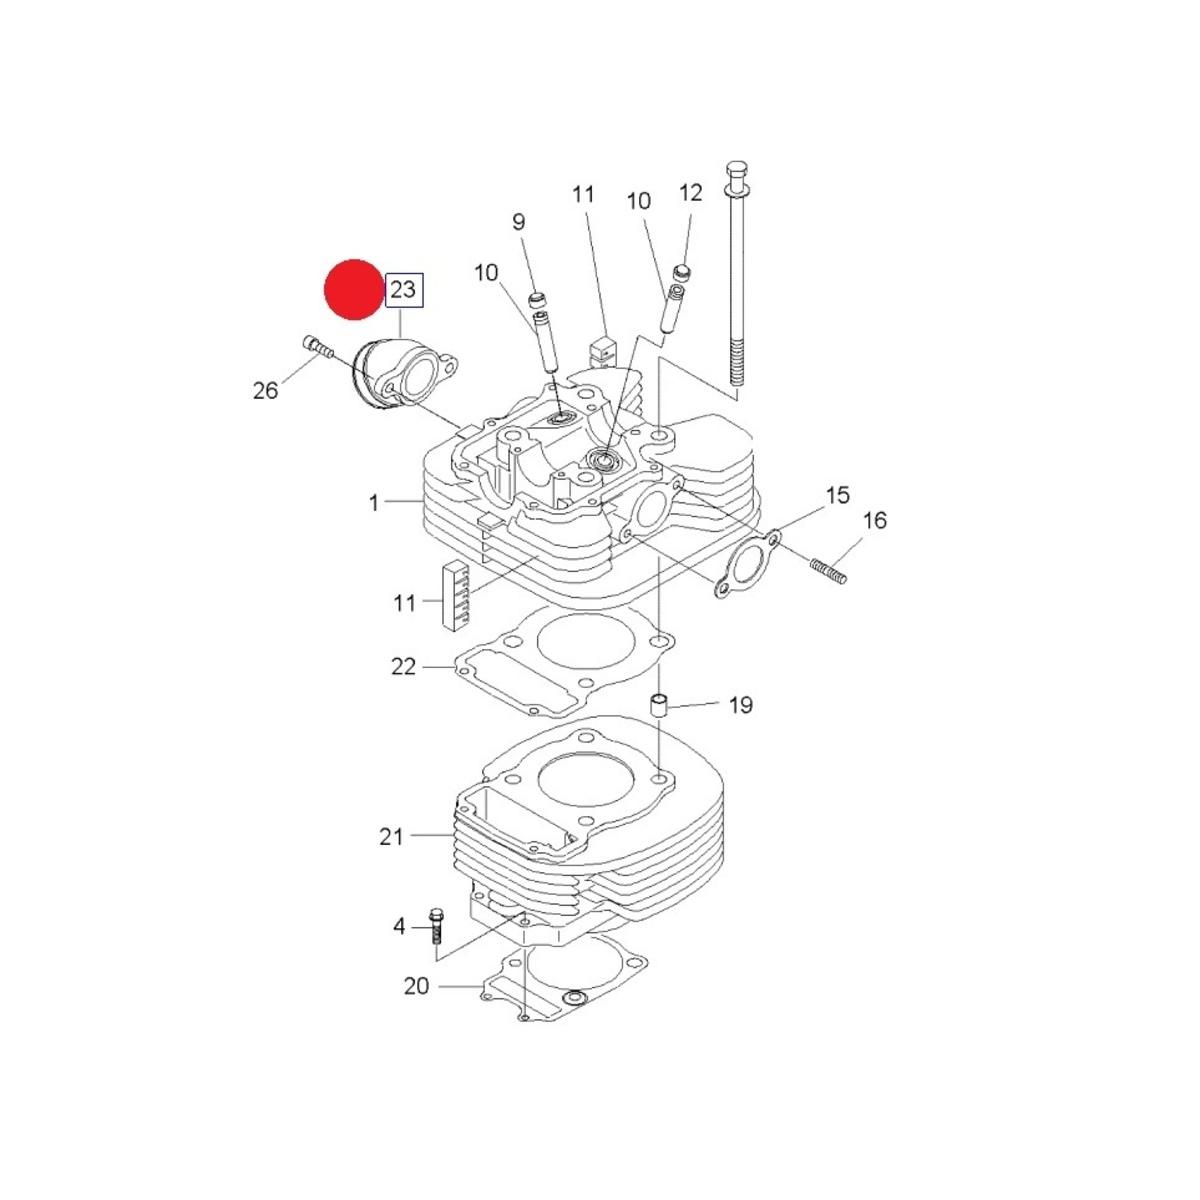 Polaris Trail Boss 330 Wiring Diagram - Wiring Diagram